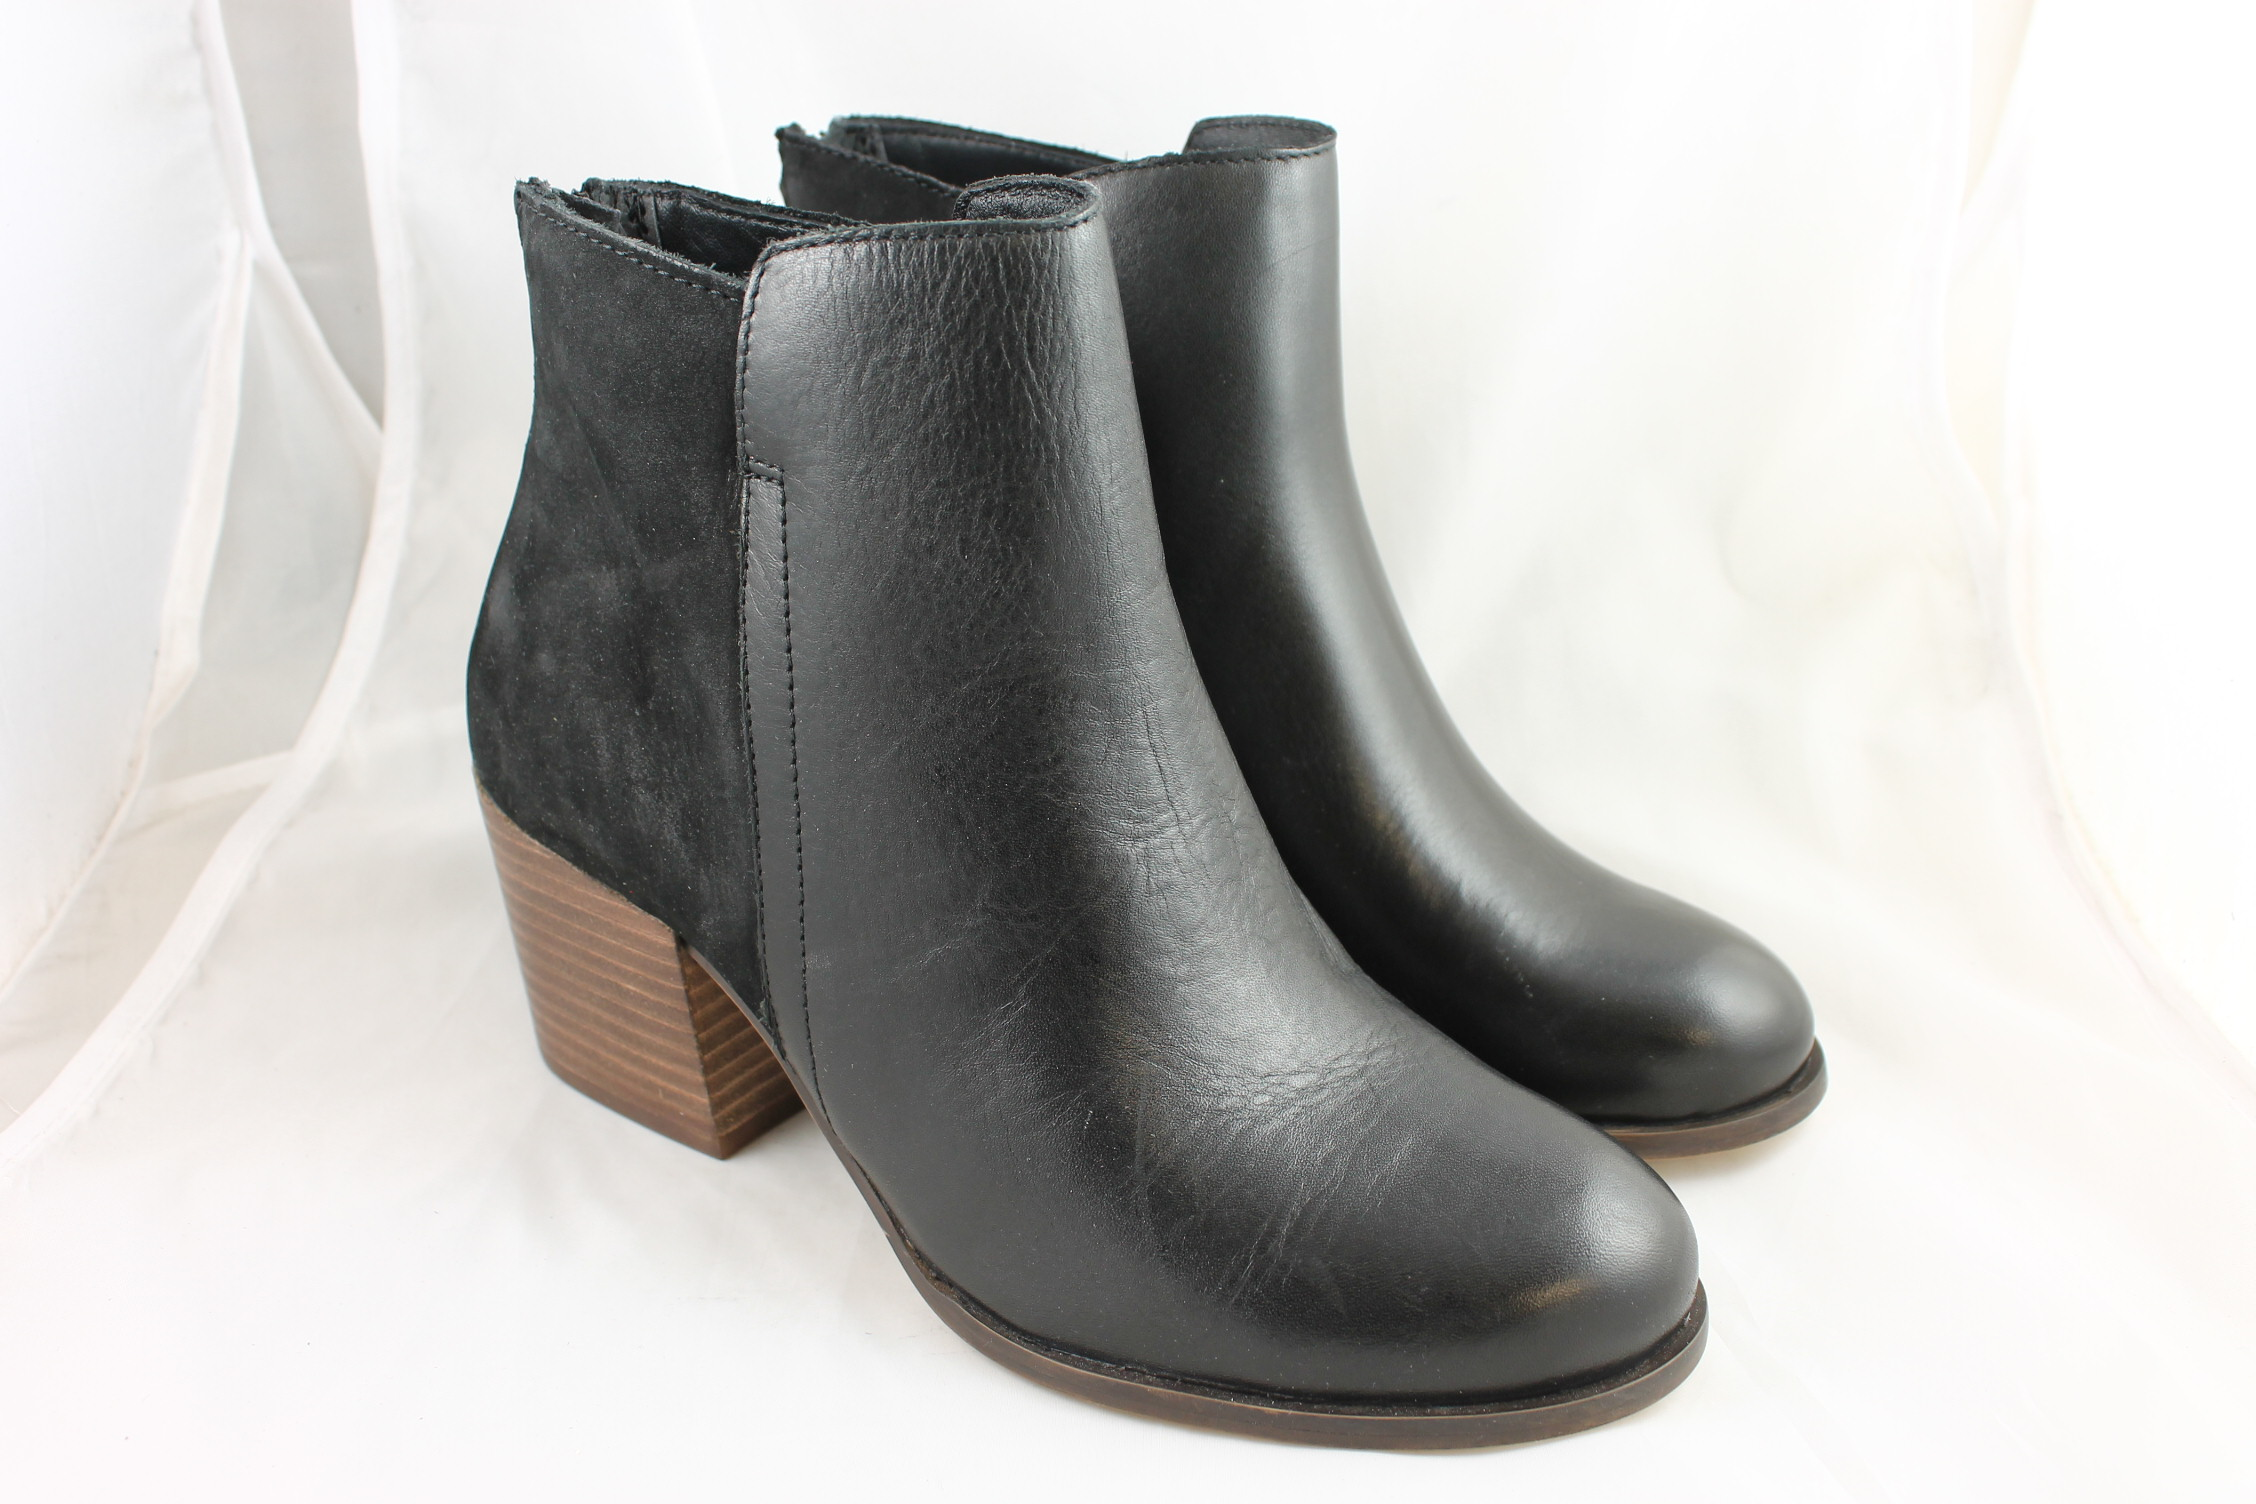 13c6ac2a8e23 Womens Office Fern Mid Heel Back Zip Boots BLACK LEATHER NUBUCK ...